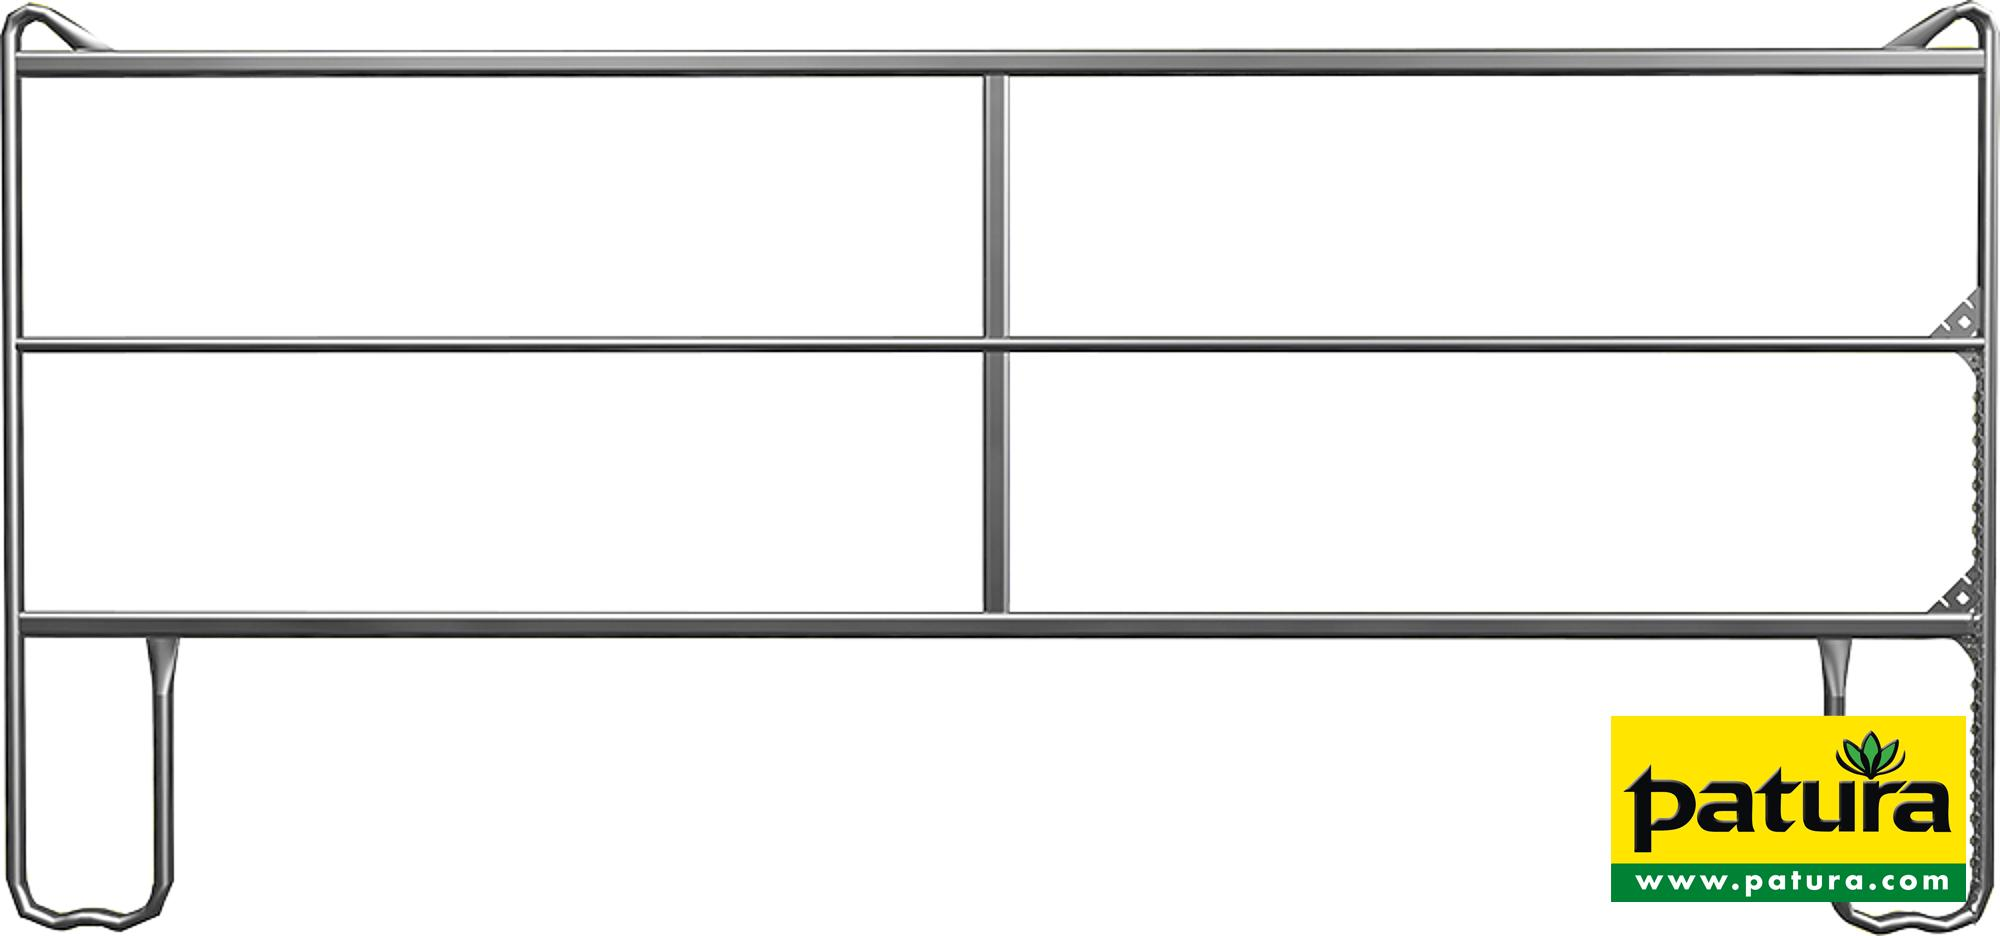 Panel-3, Länge 3,60 m, Höhe 1,70 m